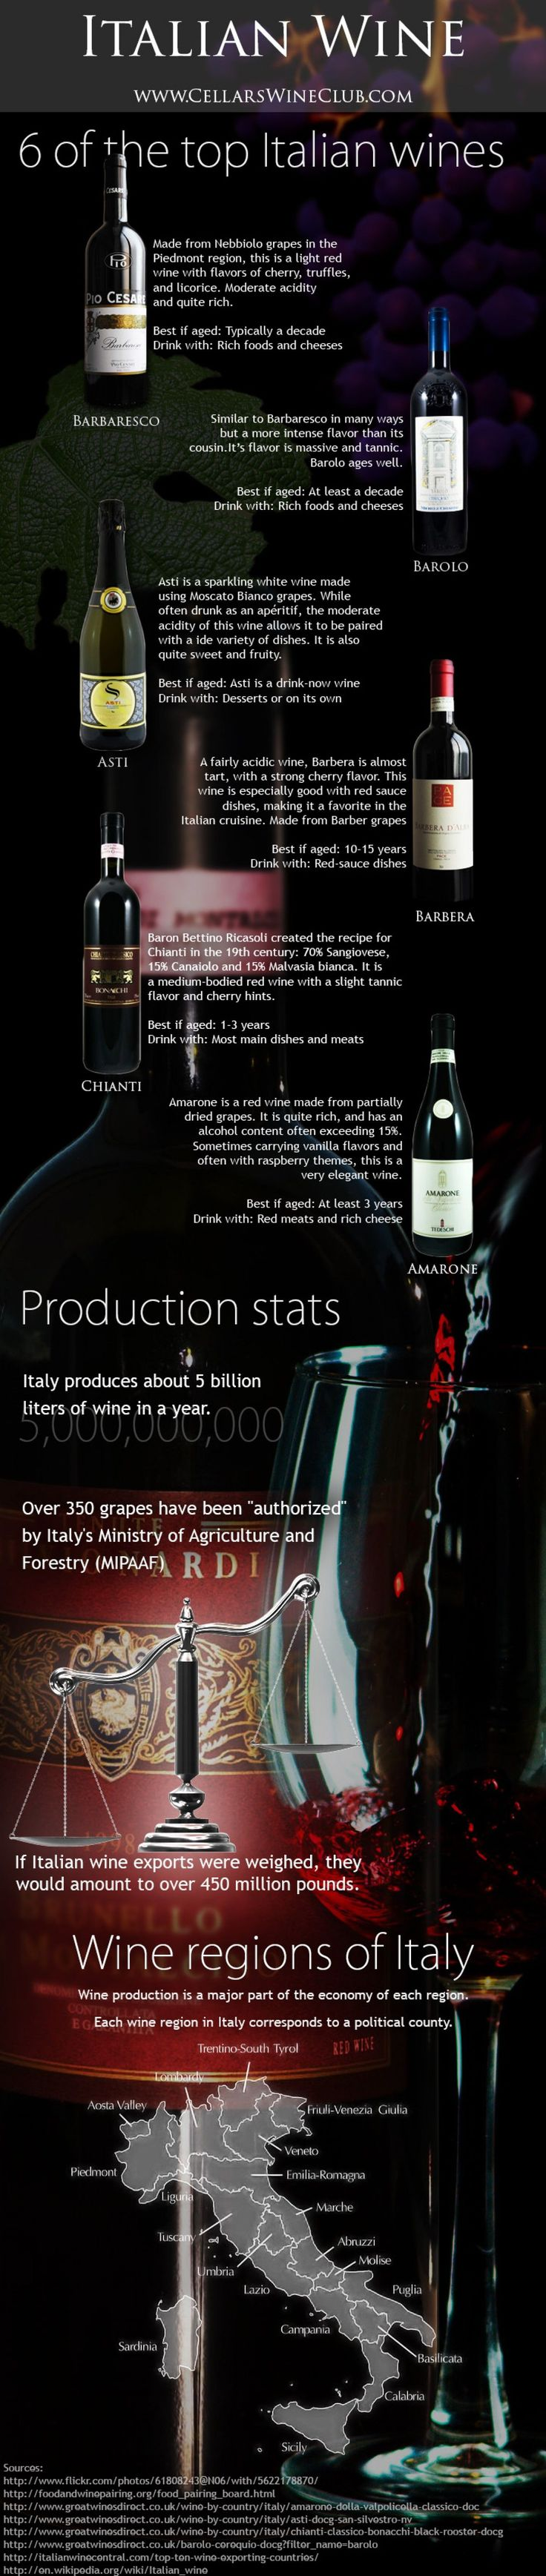 Italian Wine Infographic #wine #wineeducation #italy #italianwine